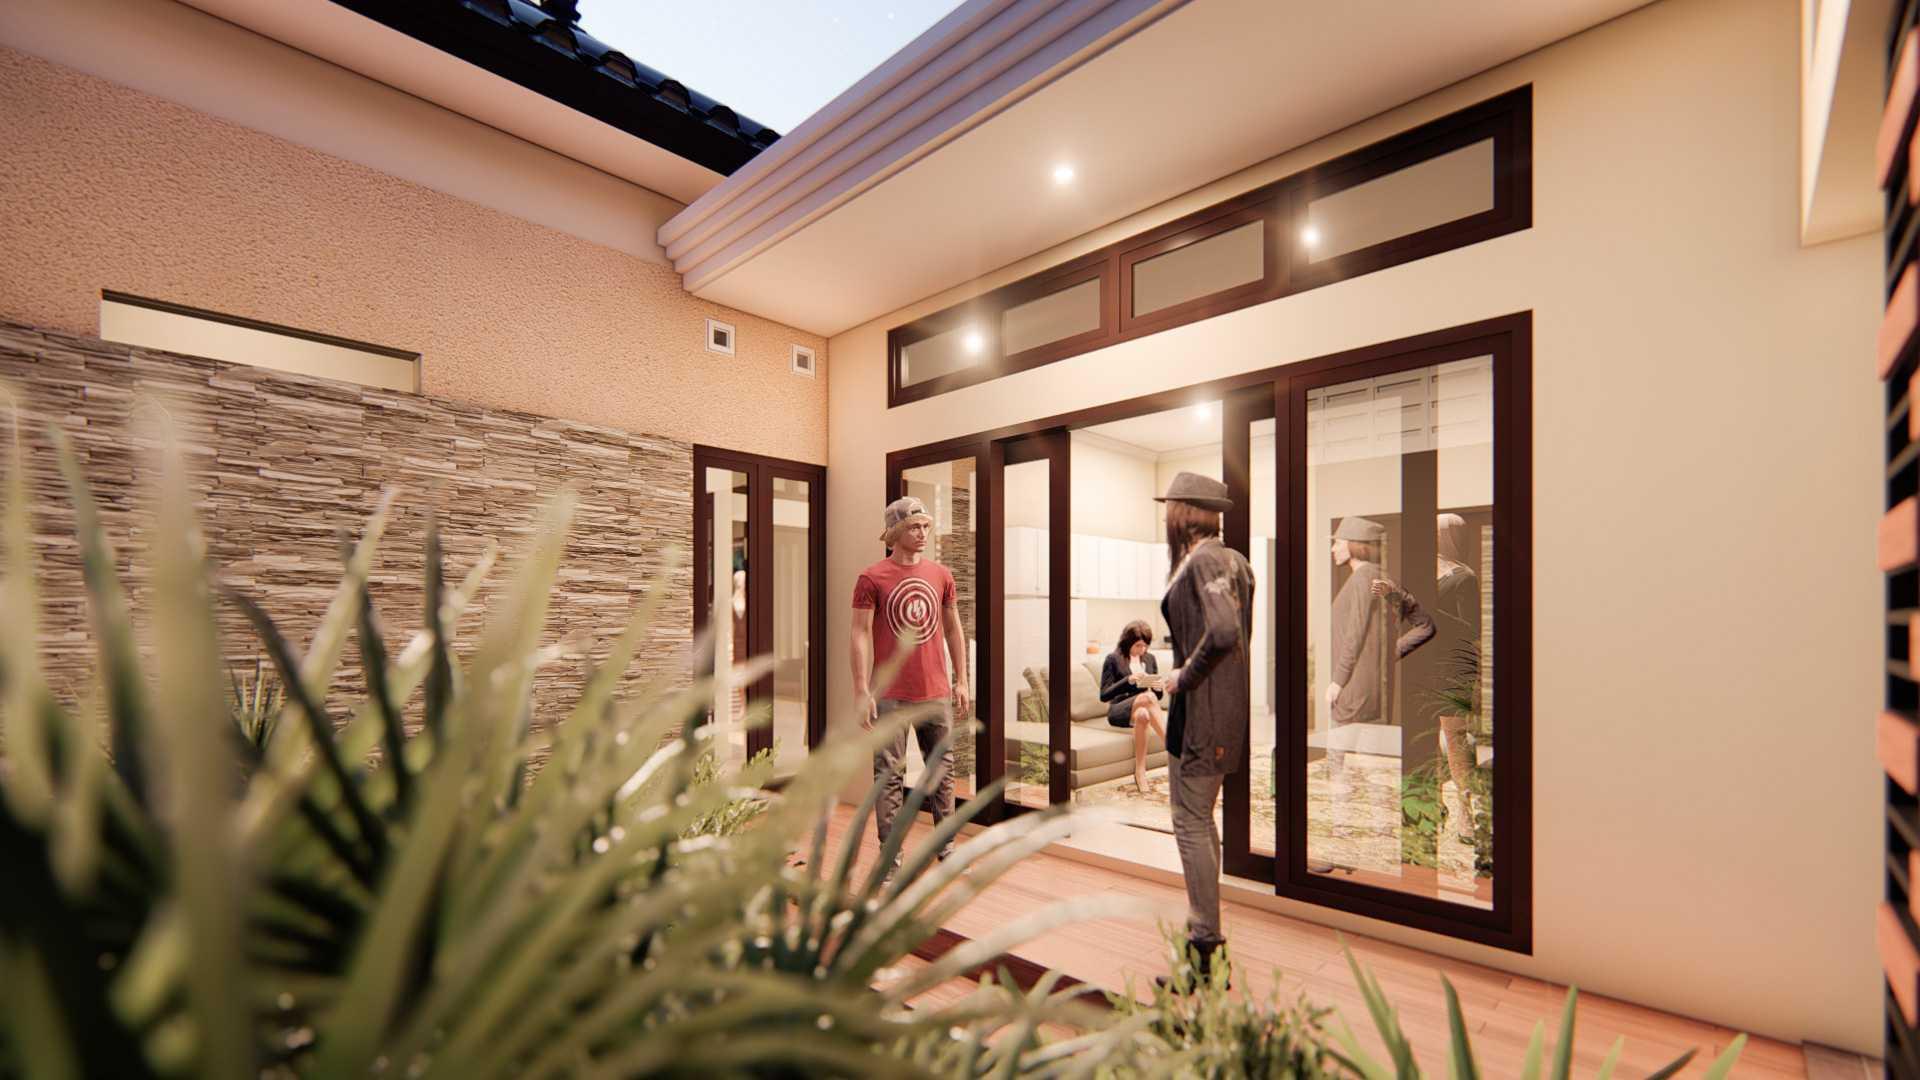 Nggambar Omah | Design And Build The Nusapenida House Blitar, Jawa Timur, Indonesia Blitar, Jawa Timur, Indonesia Nggambar-Omah-Design-And-Build-The-Nusapenida-House   75674